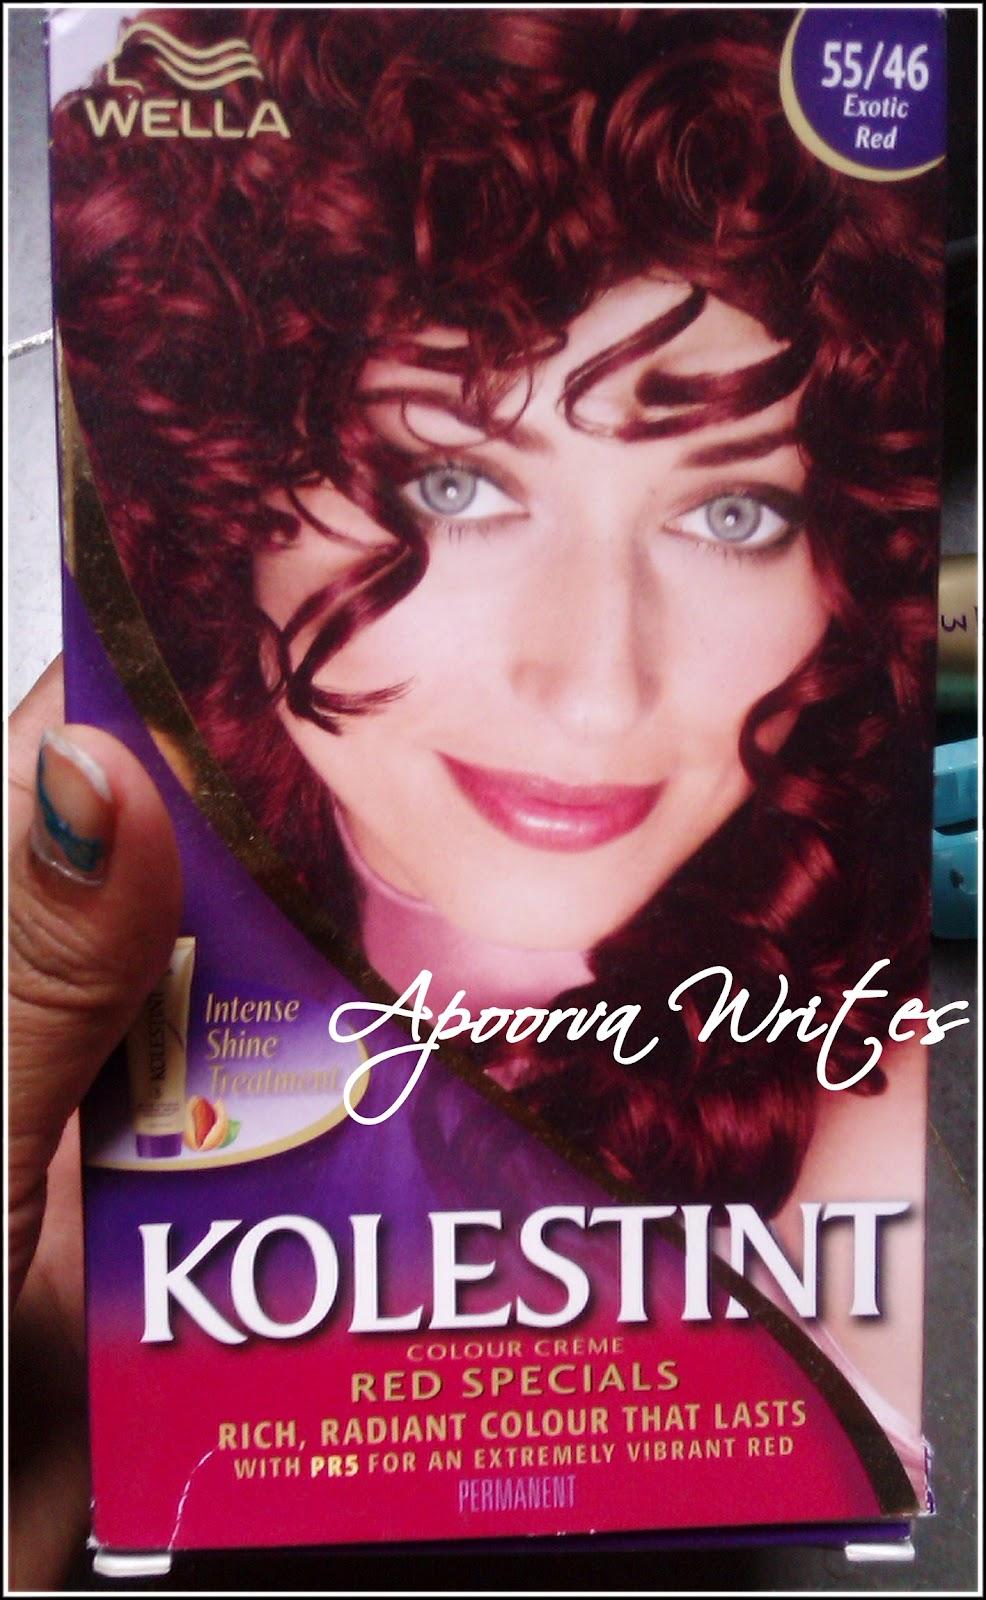 Wella Kolestint Colour Creme Exotic Red 5546 Review Gettblush